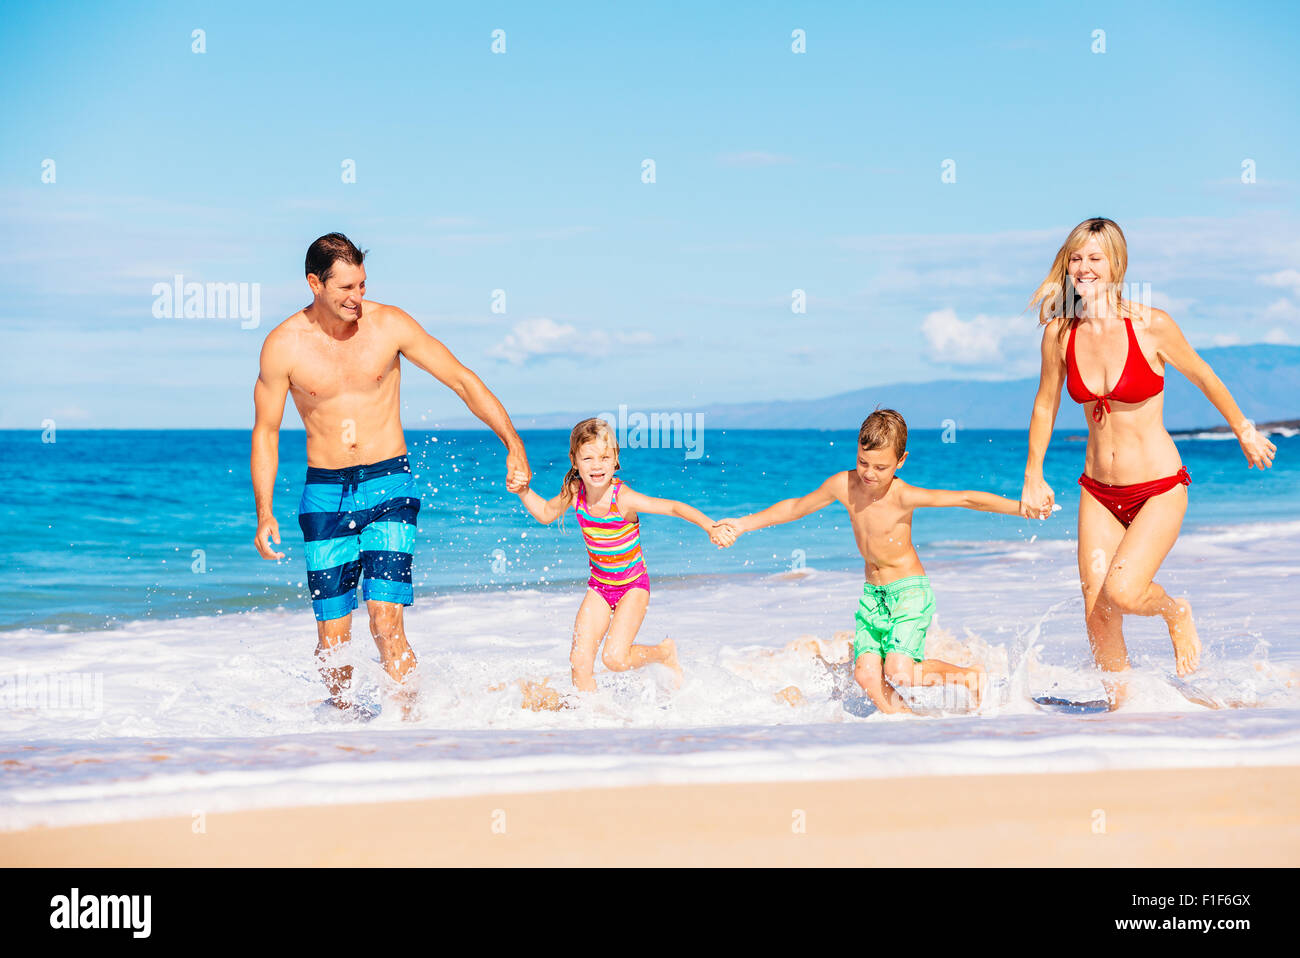 Family vacation. Happy family having fun on beautiful warm sunny beach. Outdoor summer lifestyle. - Stock Image